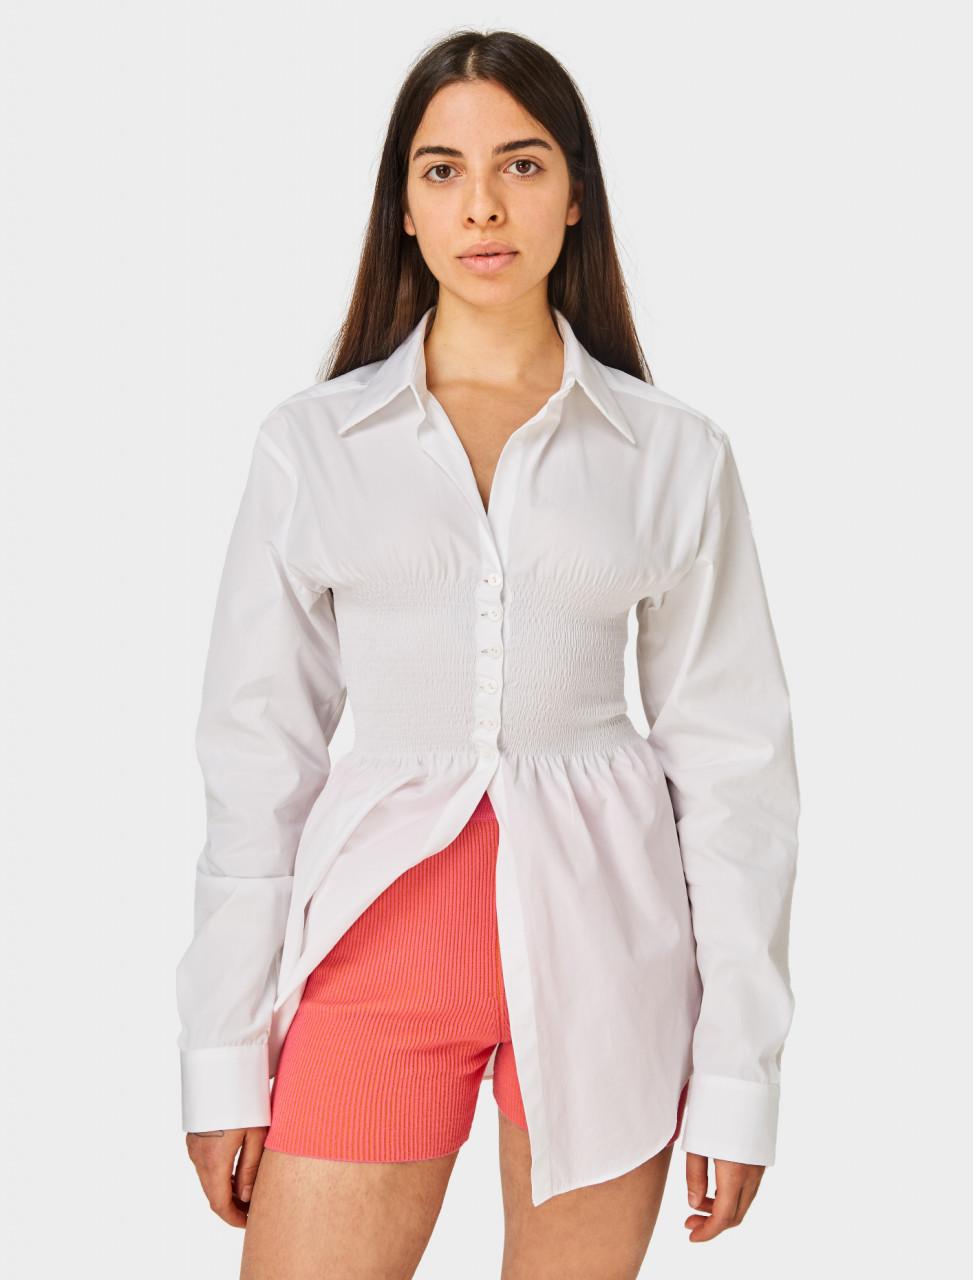 Super YAYA Bustier Shirt in White